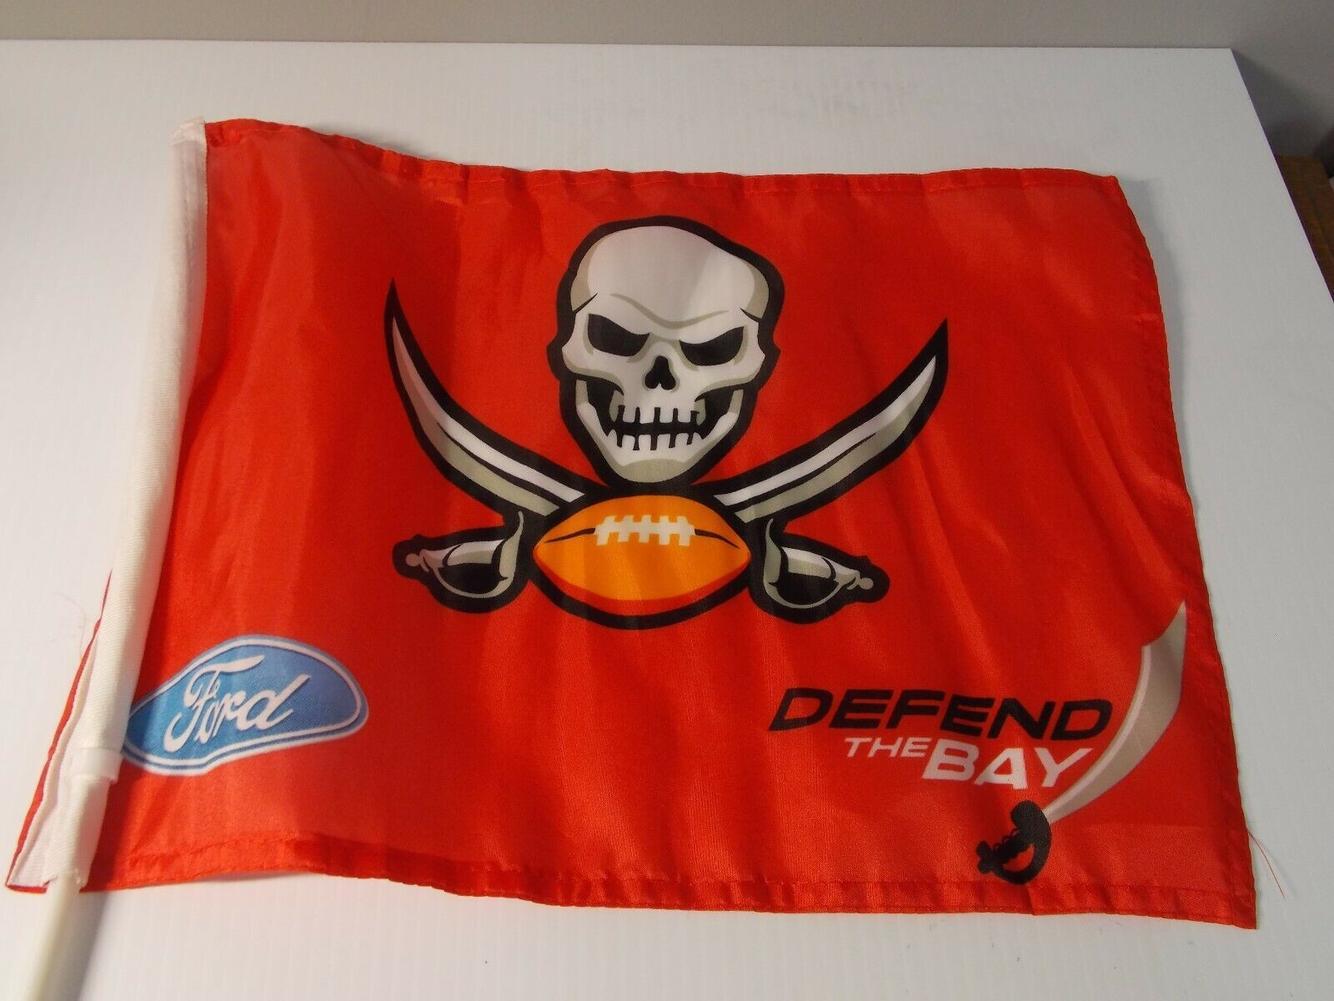 Nfl Car Window Flag Tampa Bay Buccaneers Football Memorabilia